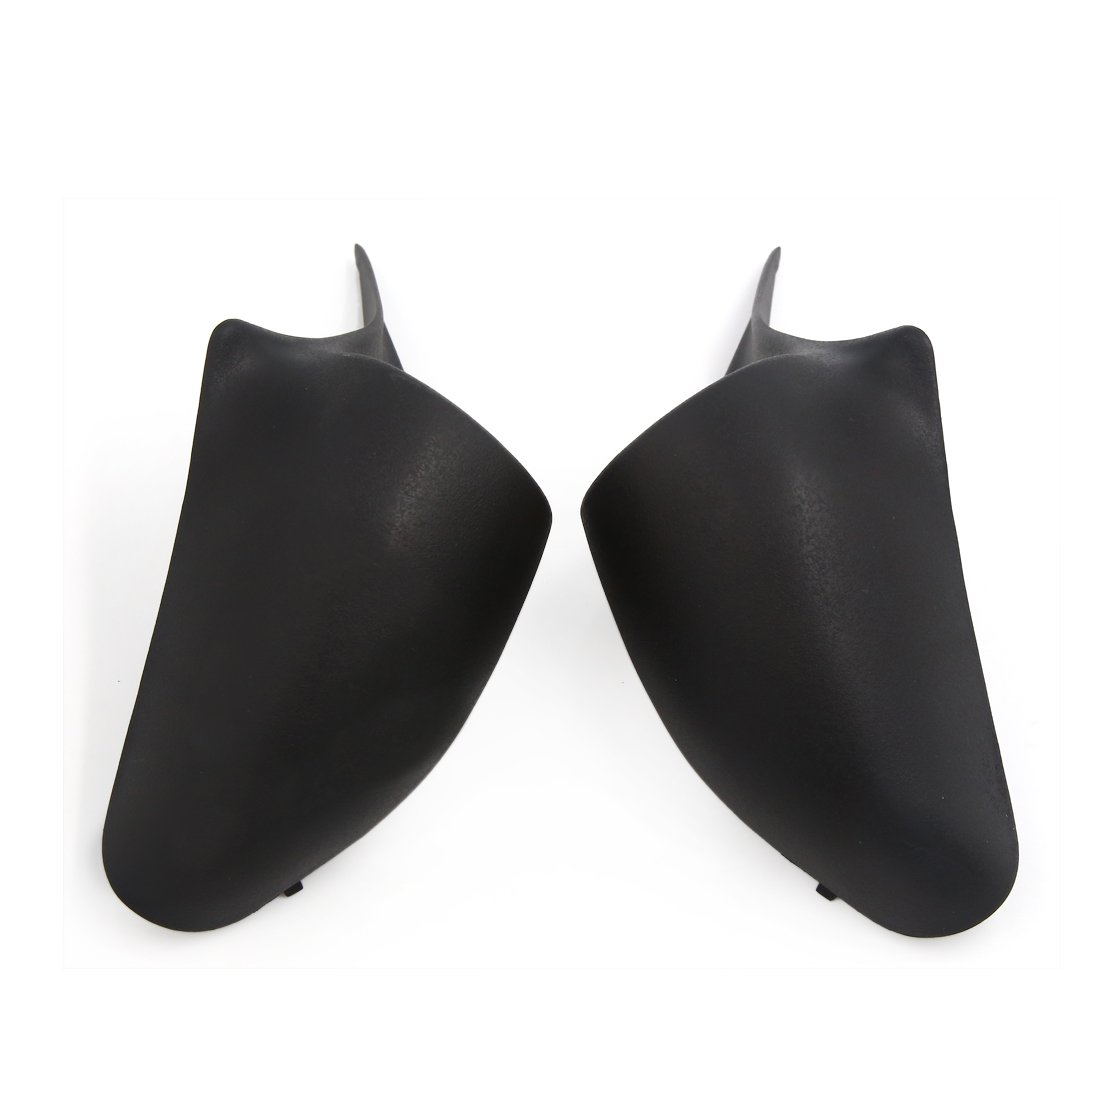 uxcell 2 Pcs Black Car Horn Dustproof Cover for 2010-2011 Honda Jazz FIT